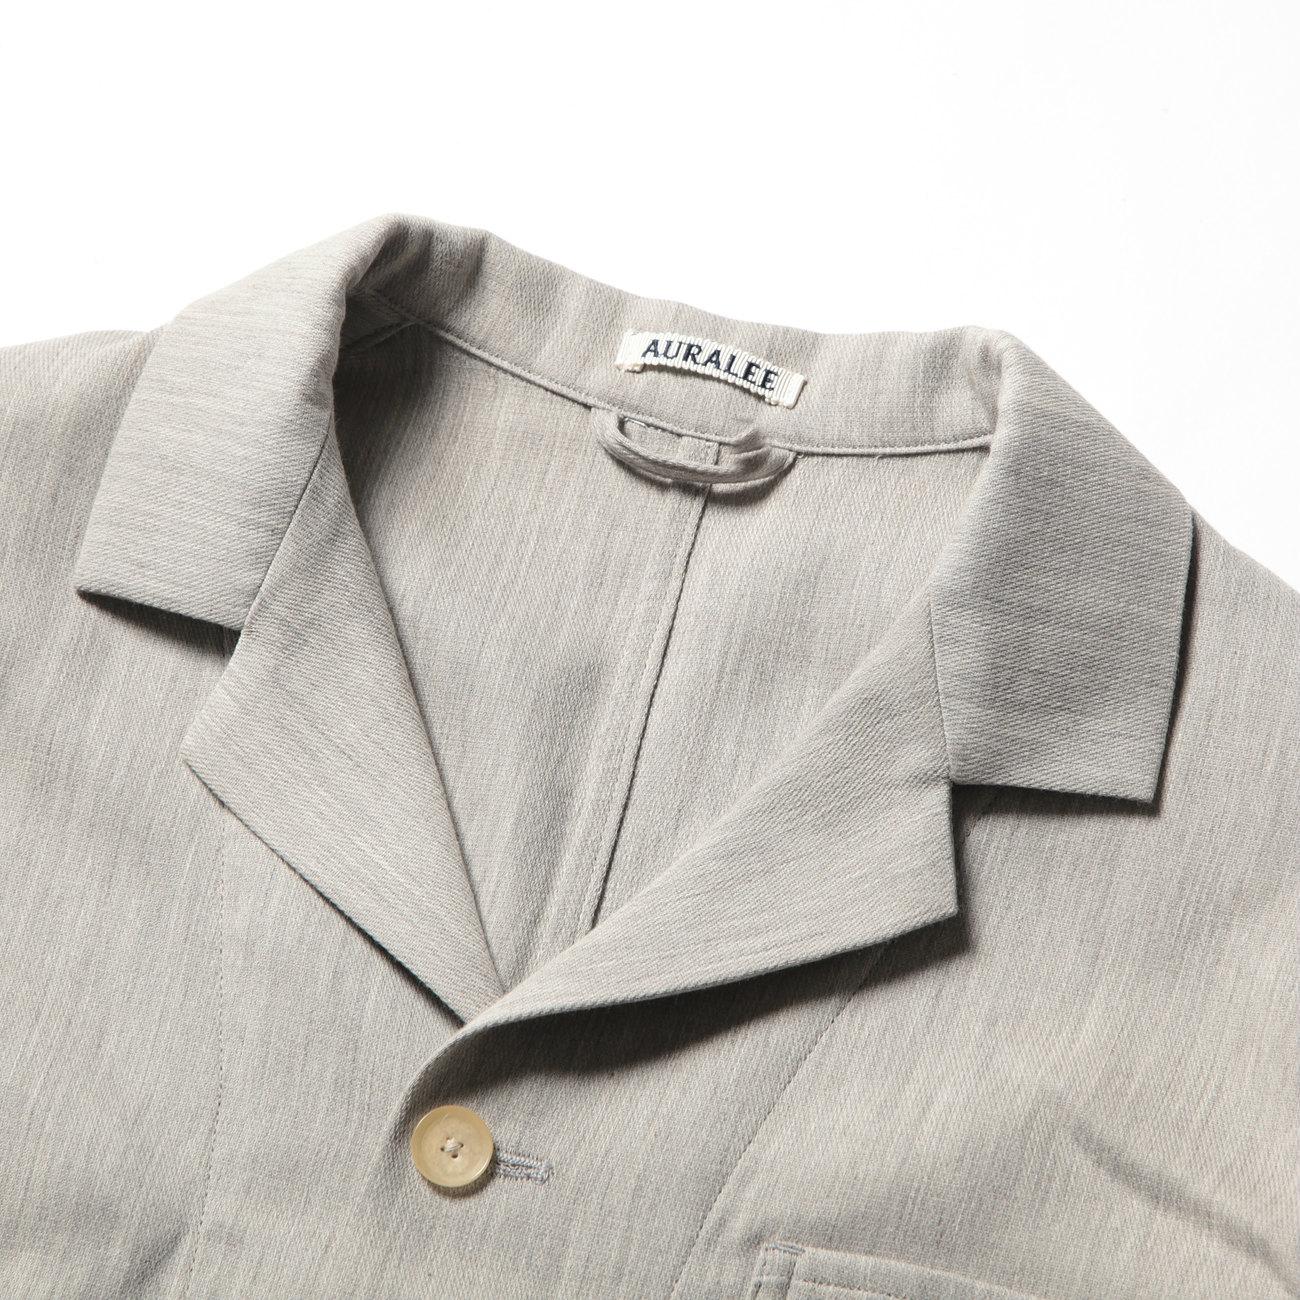 AURALEE オーラリー COTTON WOOL DOUBLE CLOTH BLOUZON - Yaku Top Gray